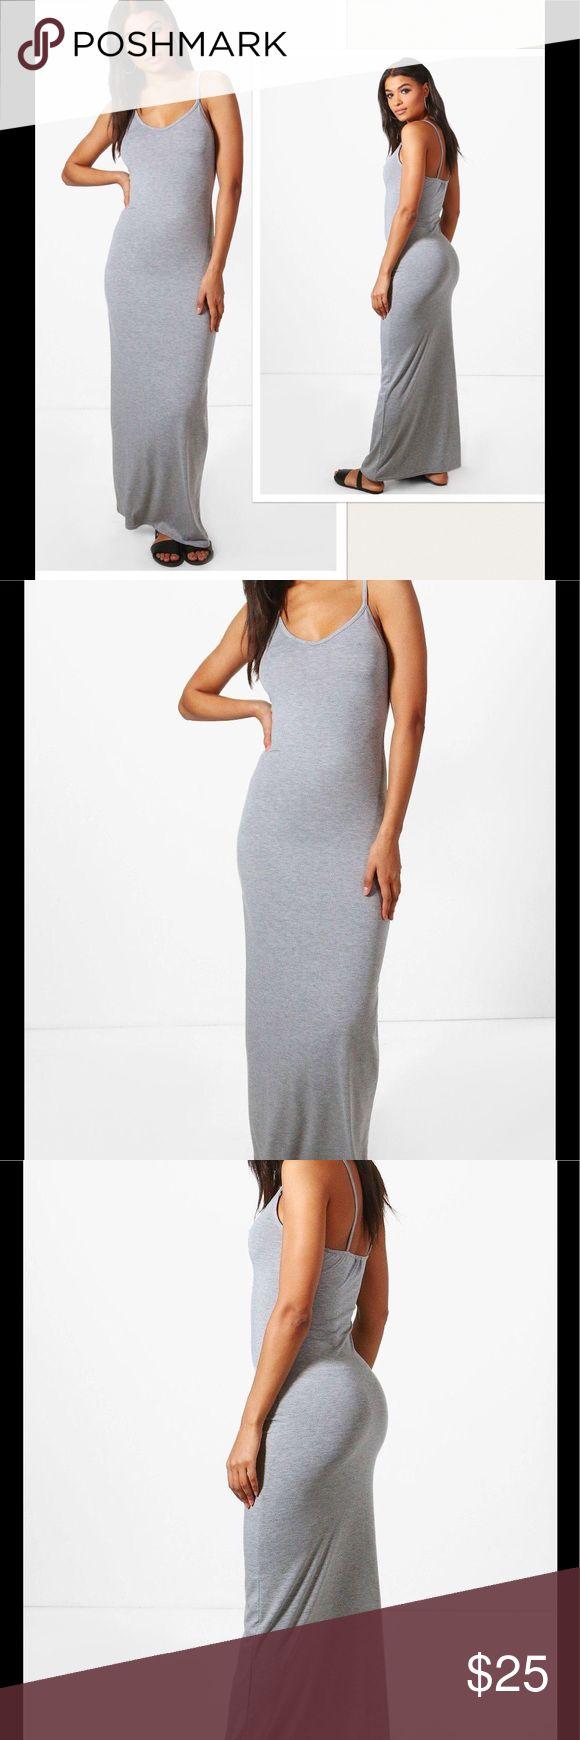 "NWT Grey Maxi Dress Sz 6 95% Viscose, 5% Elastane. Flat Measurement of Garment: Shoulder To Hem 58"", Bust 28"". Machine Washable. Model Wears Size 6. Brand sold at ASOS.com. Asos Dresses Maxi"